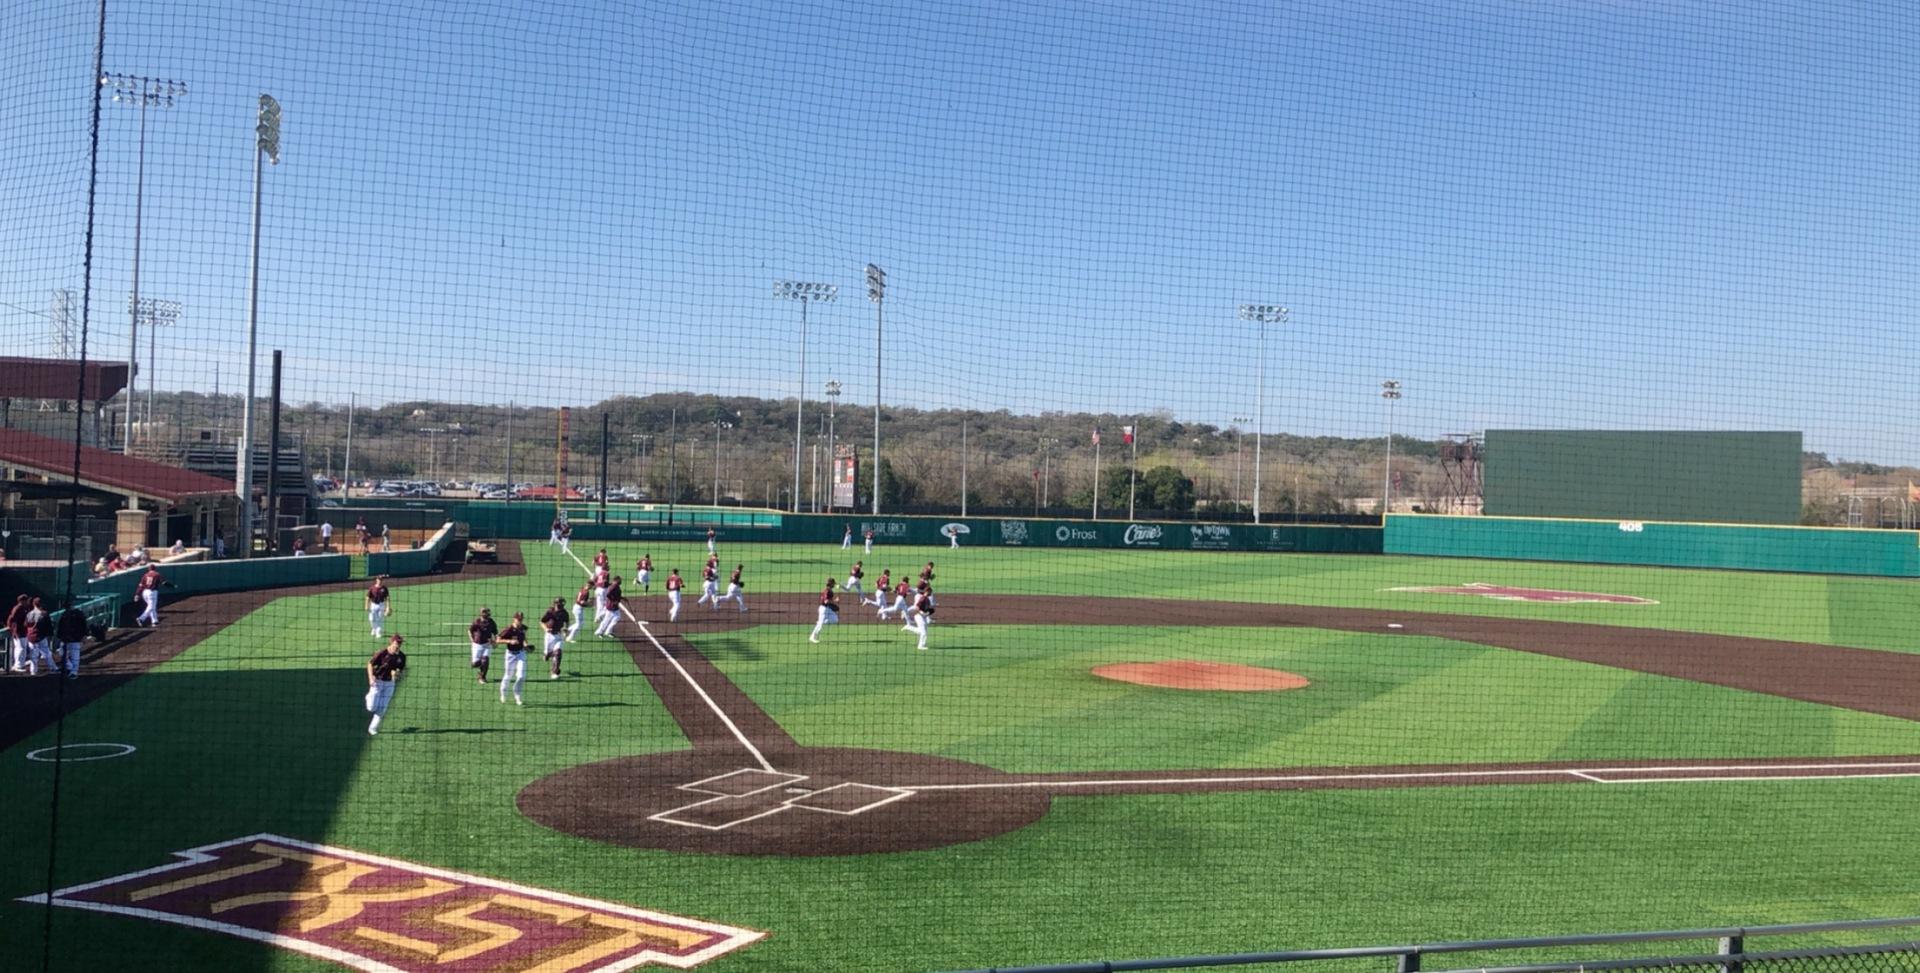 Texas State baseball players jog out on a baseball field.